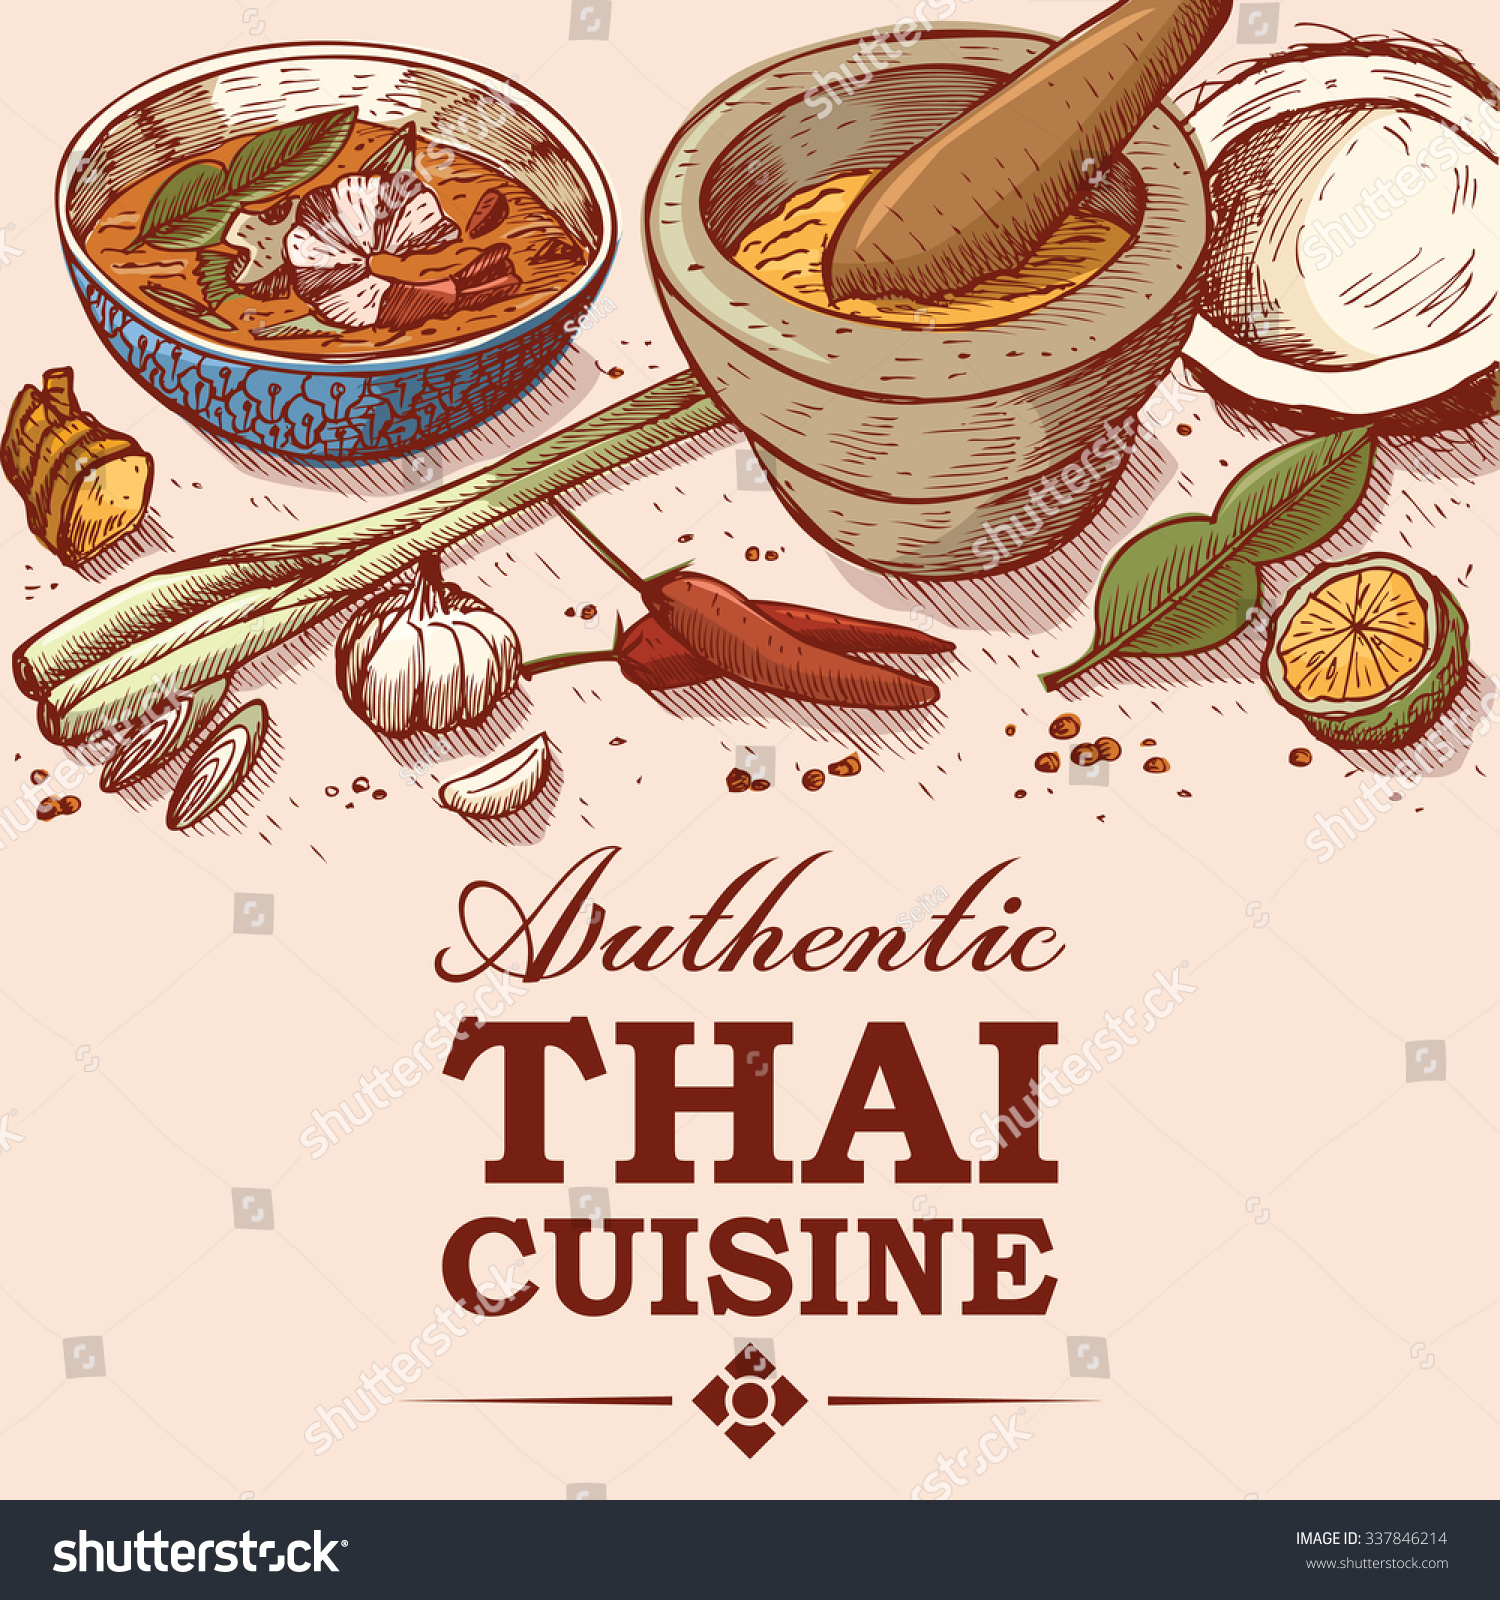 Hand Drawn Illustration Thai Food Ingredients Stock Vector 337846214 - Shutterstock